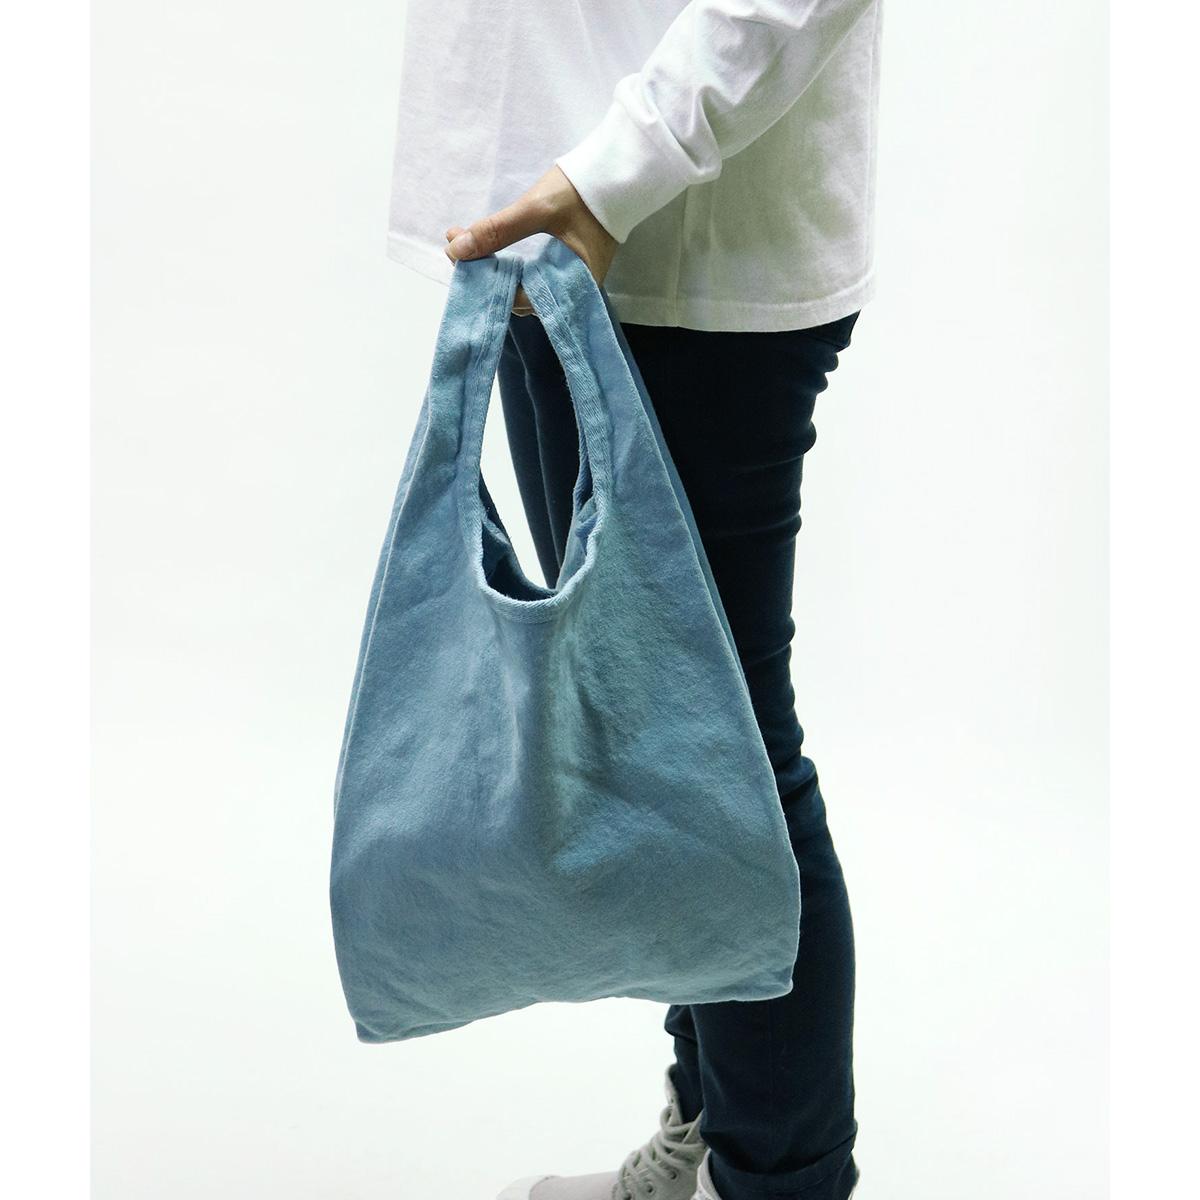 【MAKEUP】倉敷帆布 製品染め エコバッグ L 8カラー